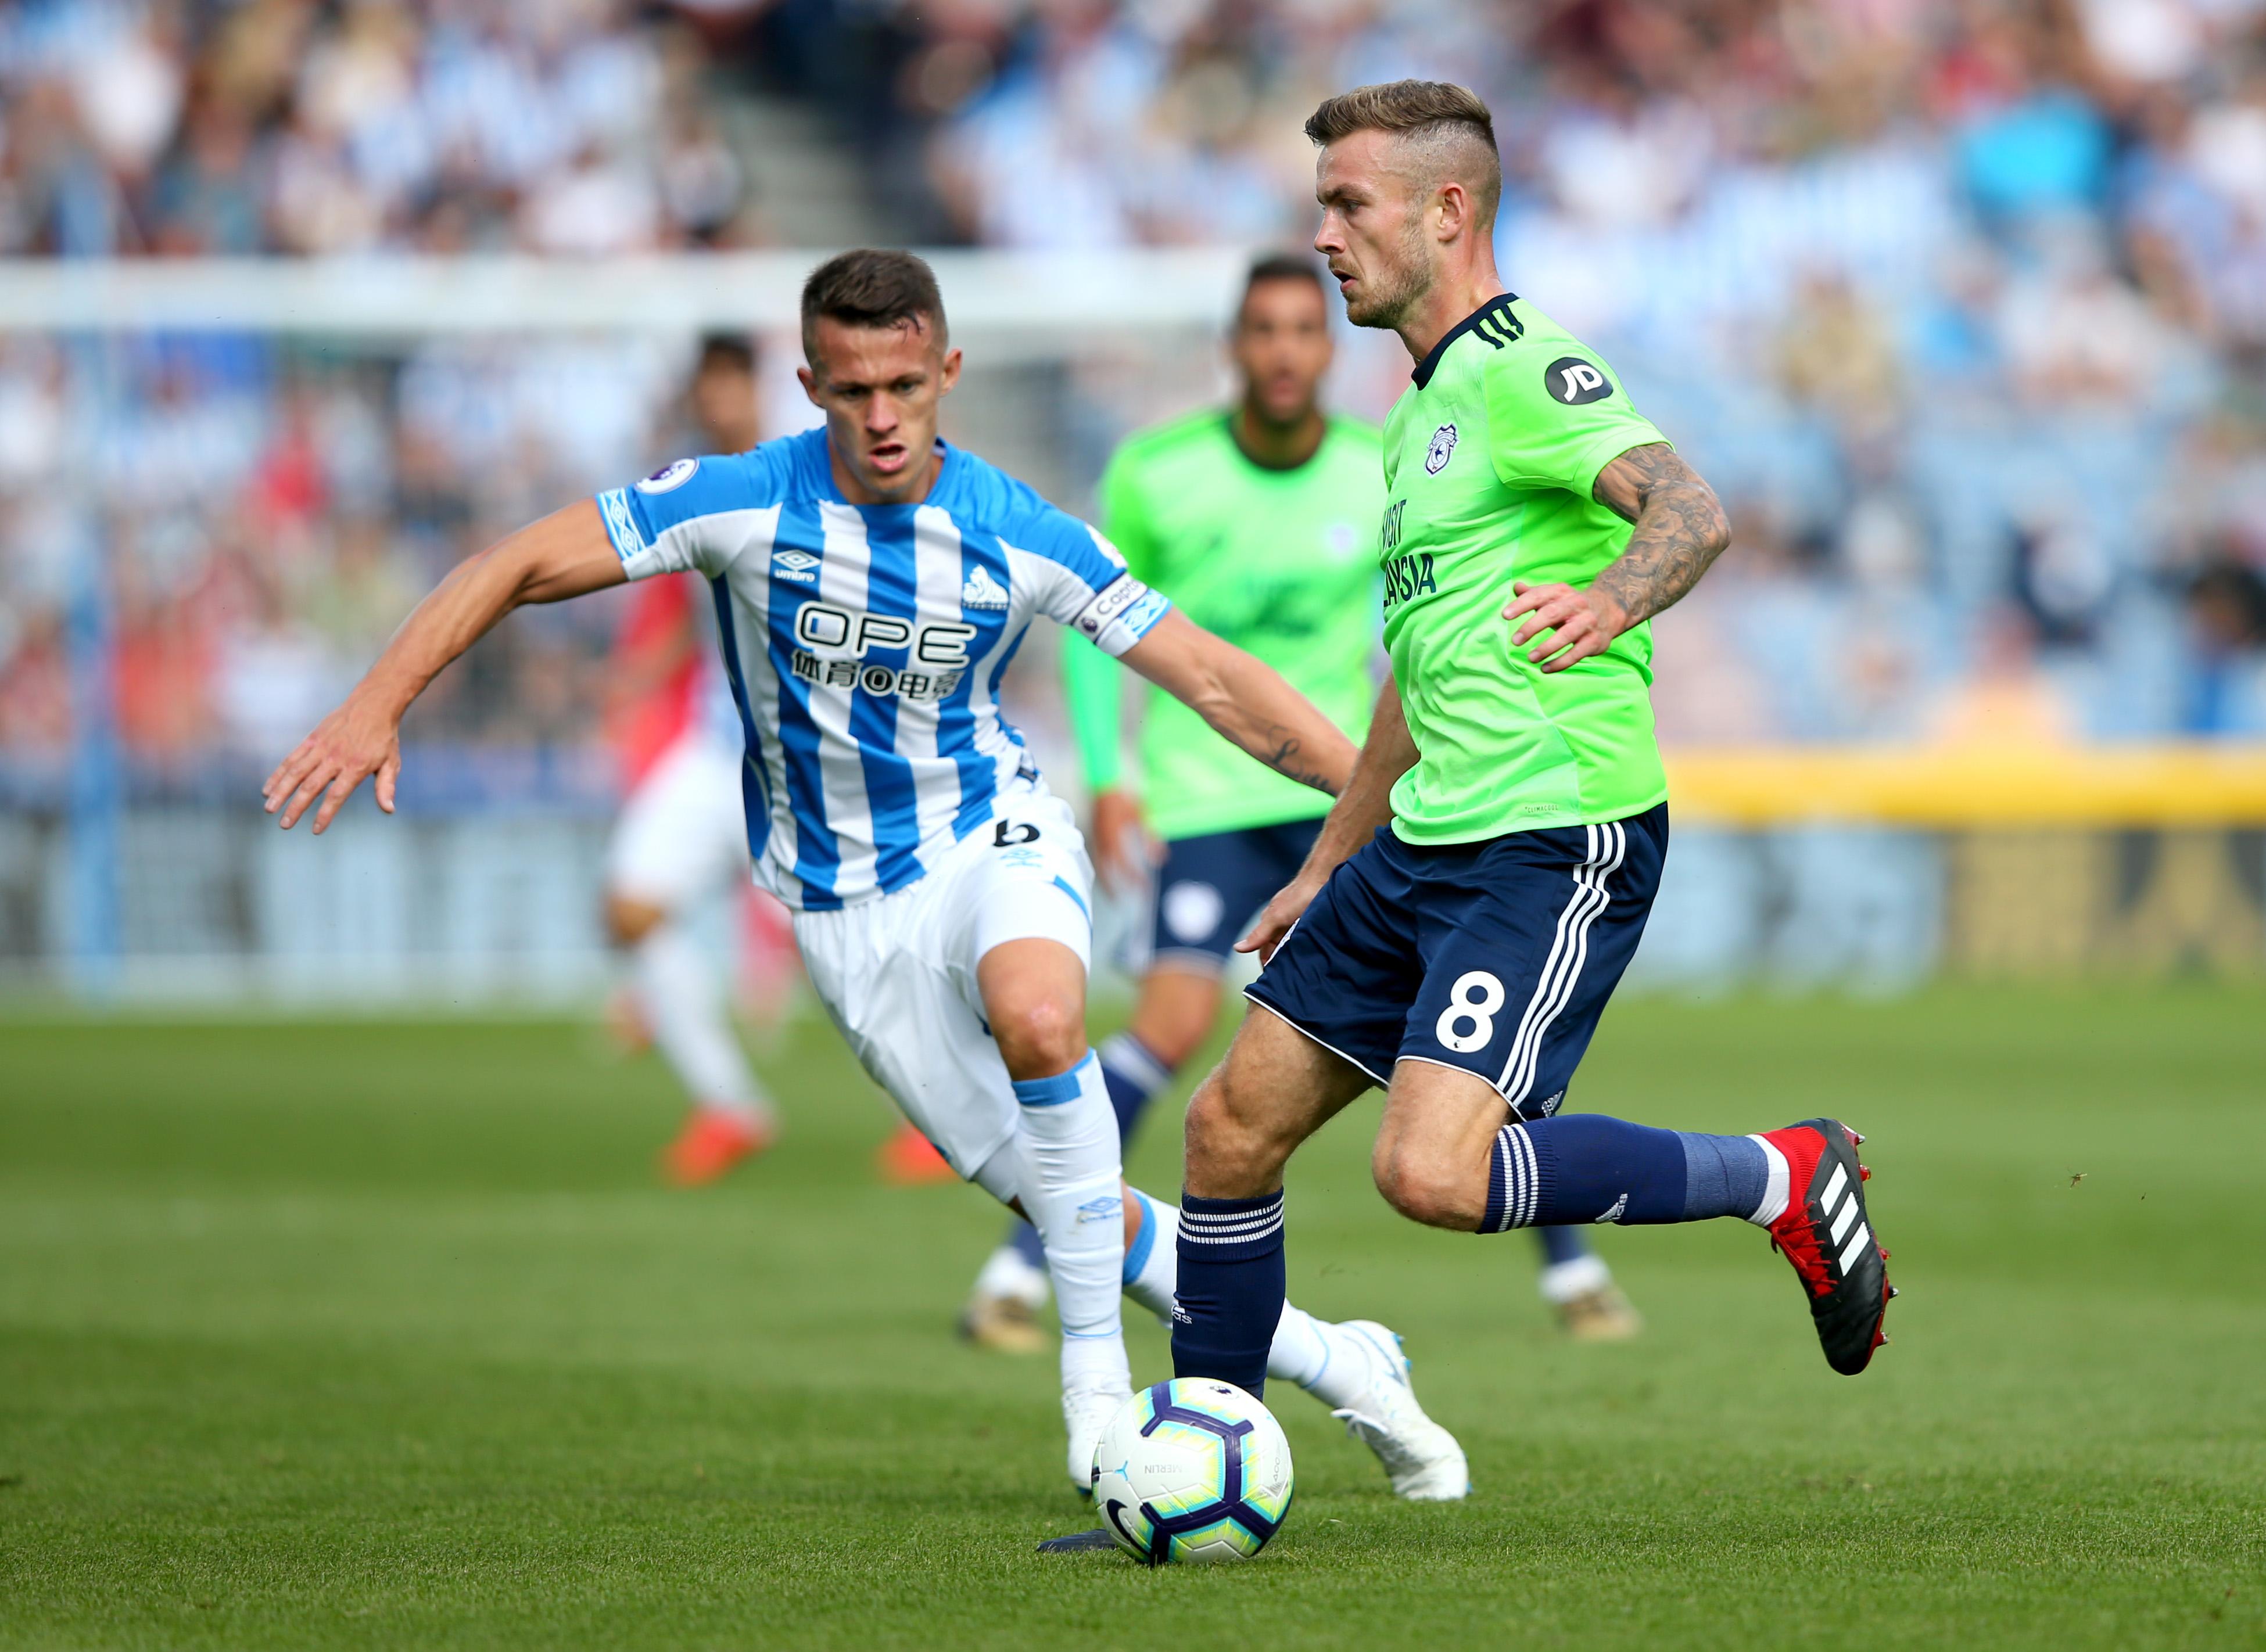 Huddersfield Town v Cardiff City - Premier League